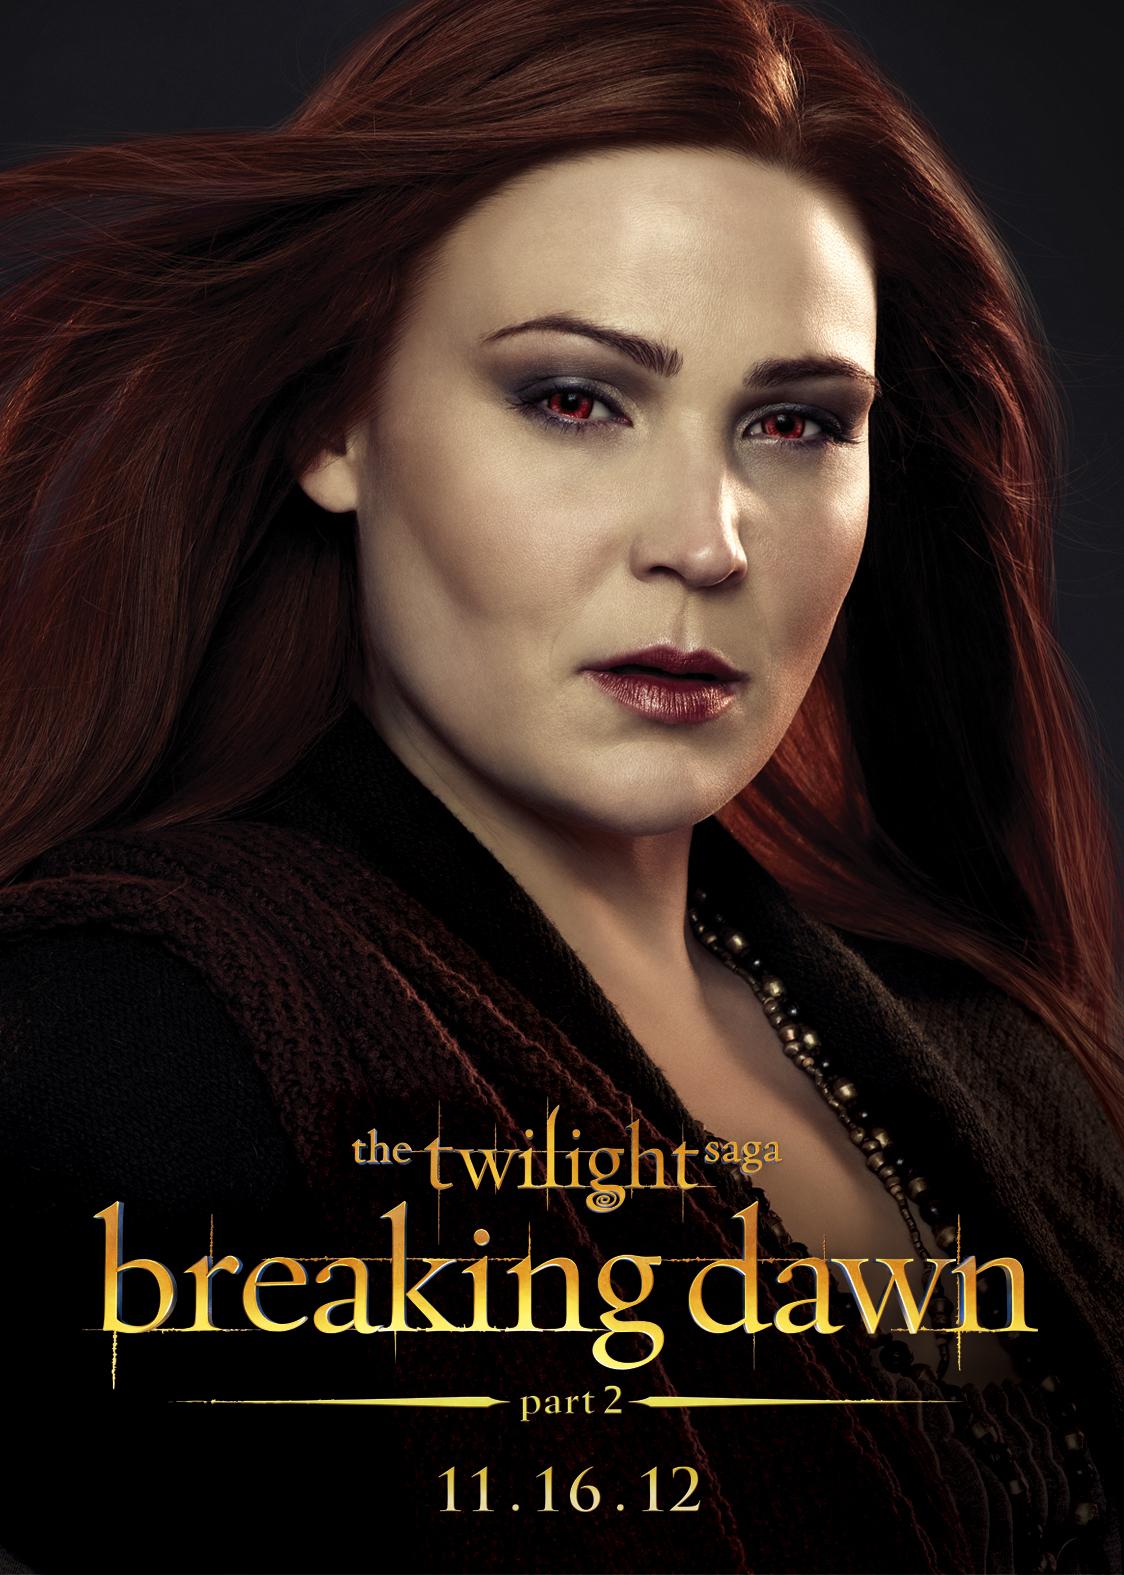 THE TWILIGHT SAGA: BREAKING DAWN – PART 2 (2012) - 23 Character ...